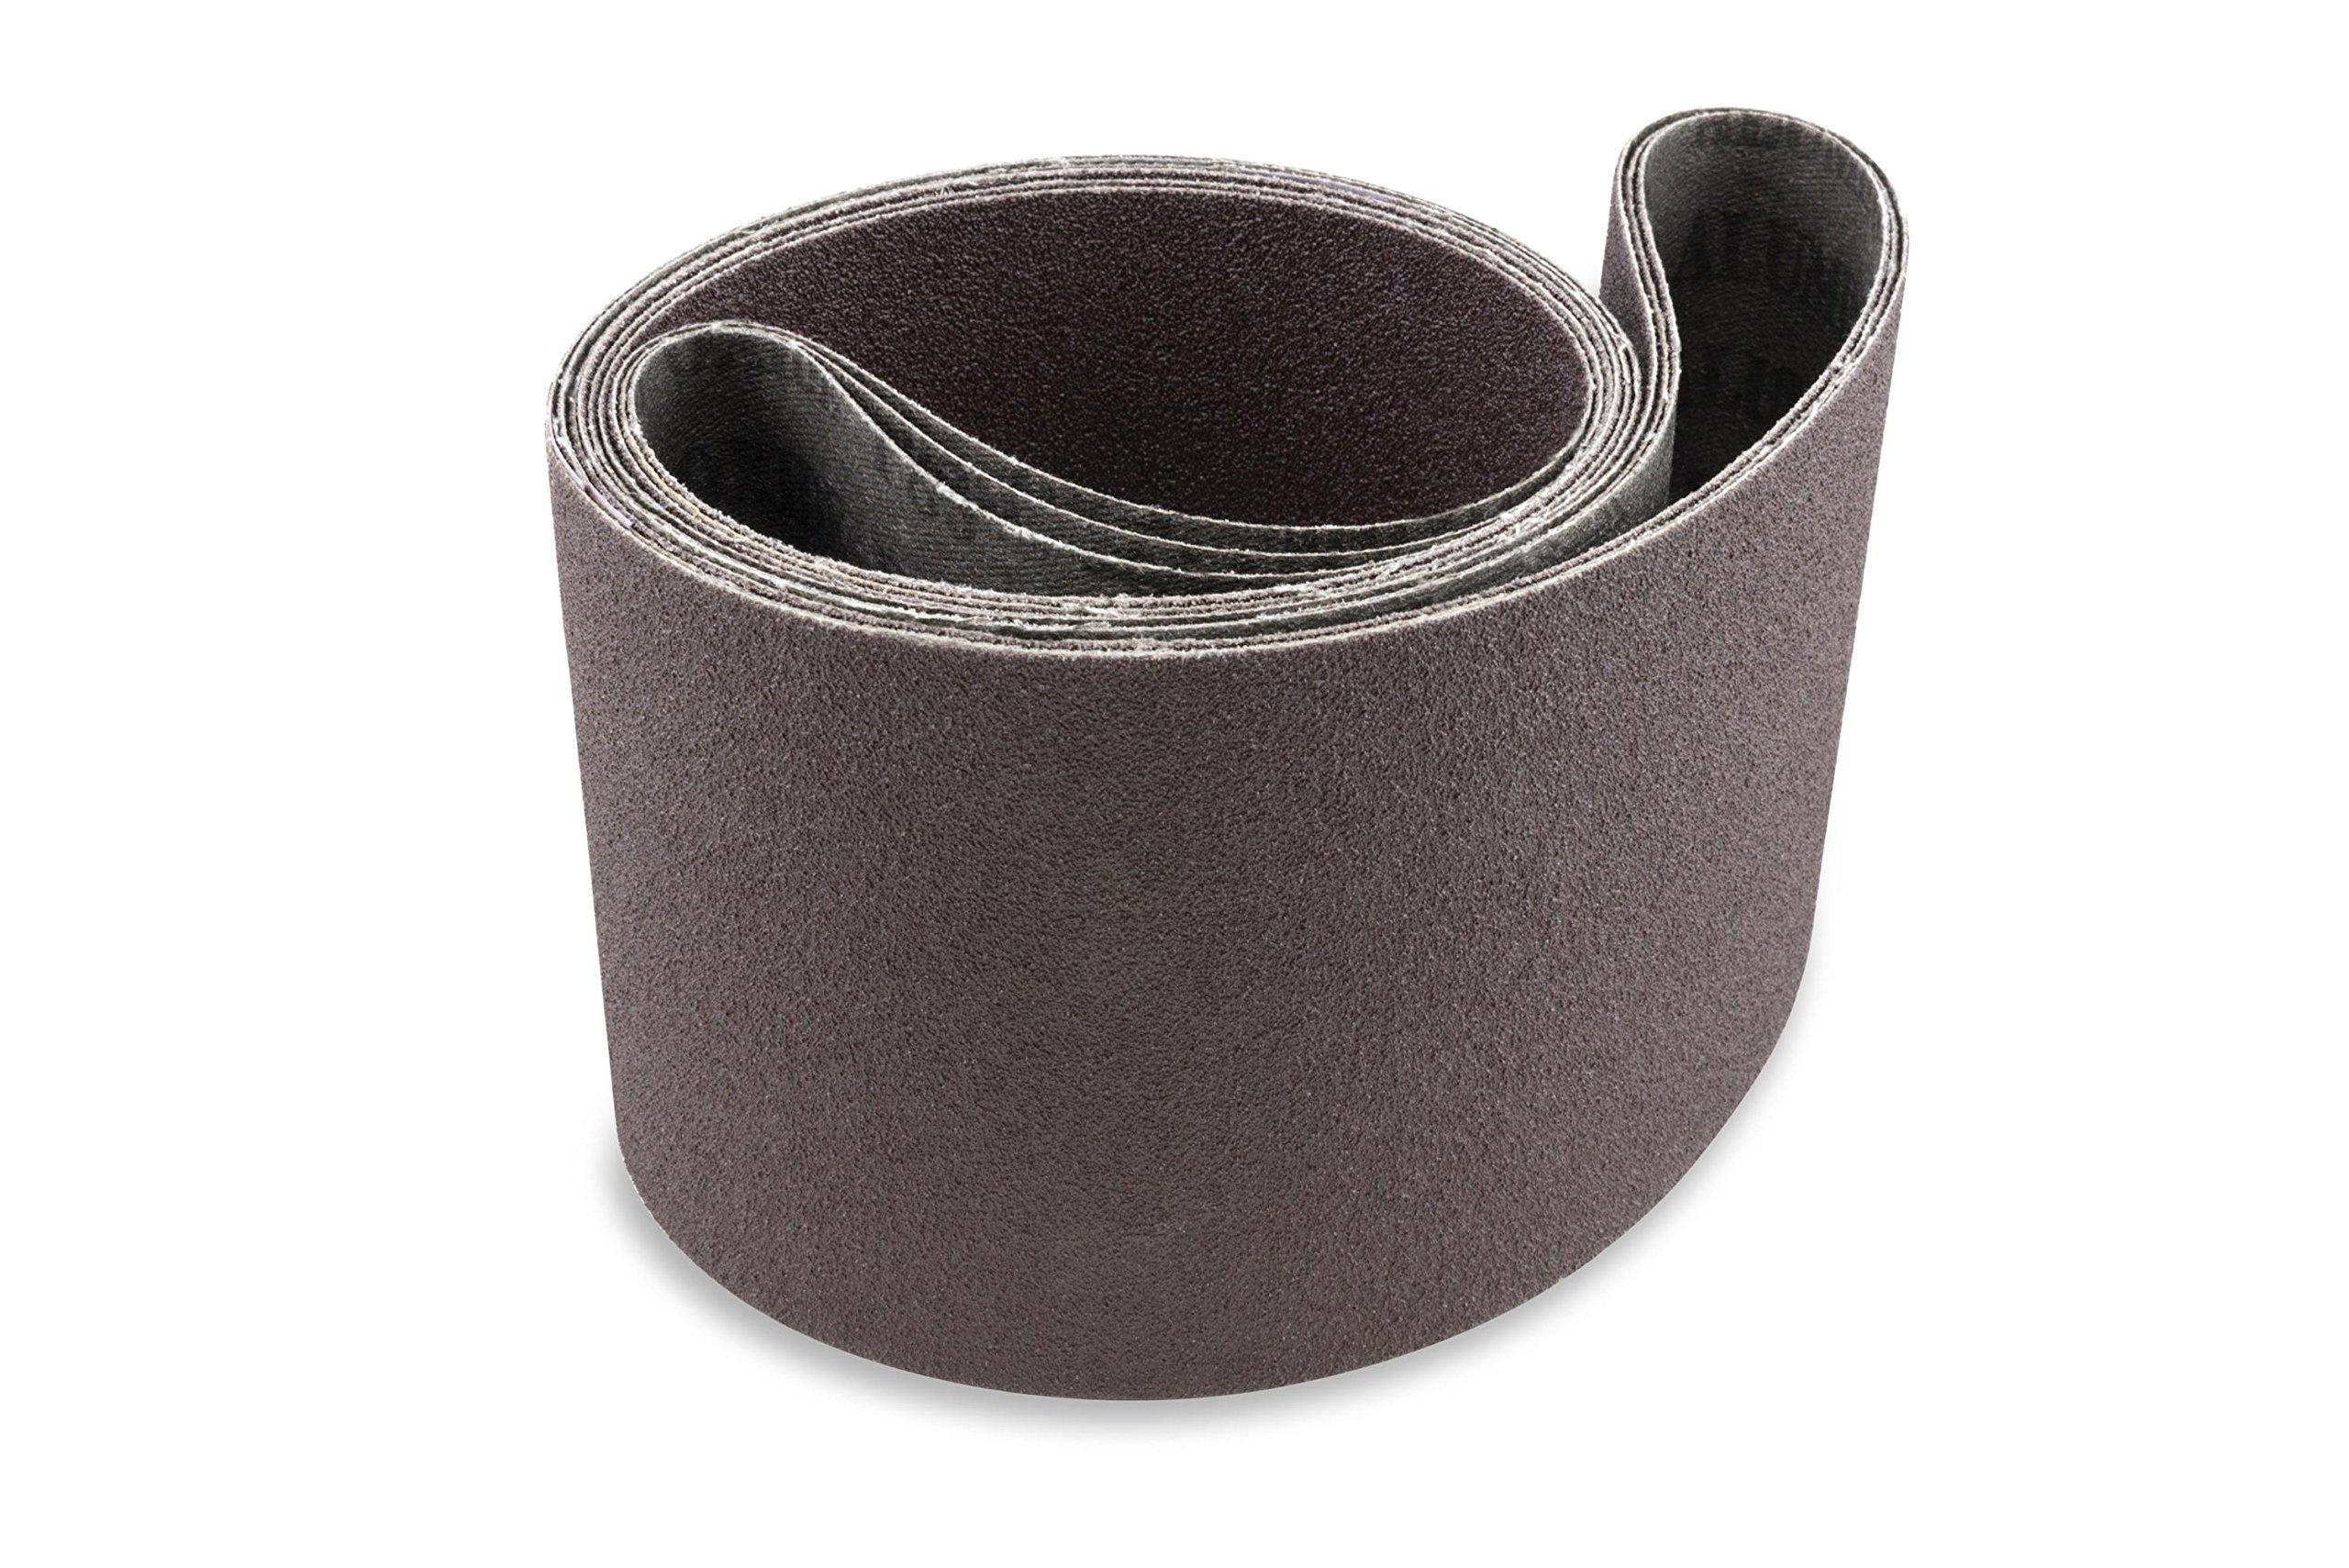 6 X 80 Inch 80 Grit Aluminum Oxide Premium Quality Multipurpose Sanding Belts, 2 Pack